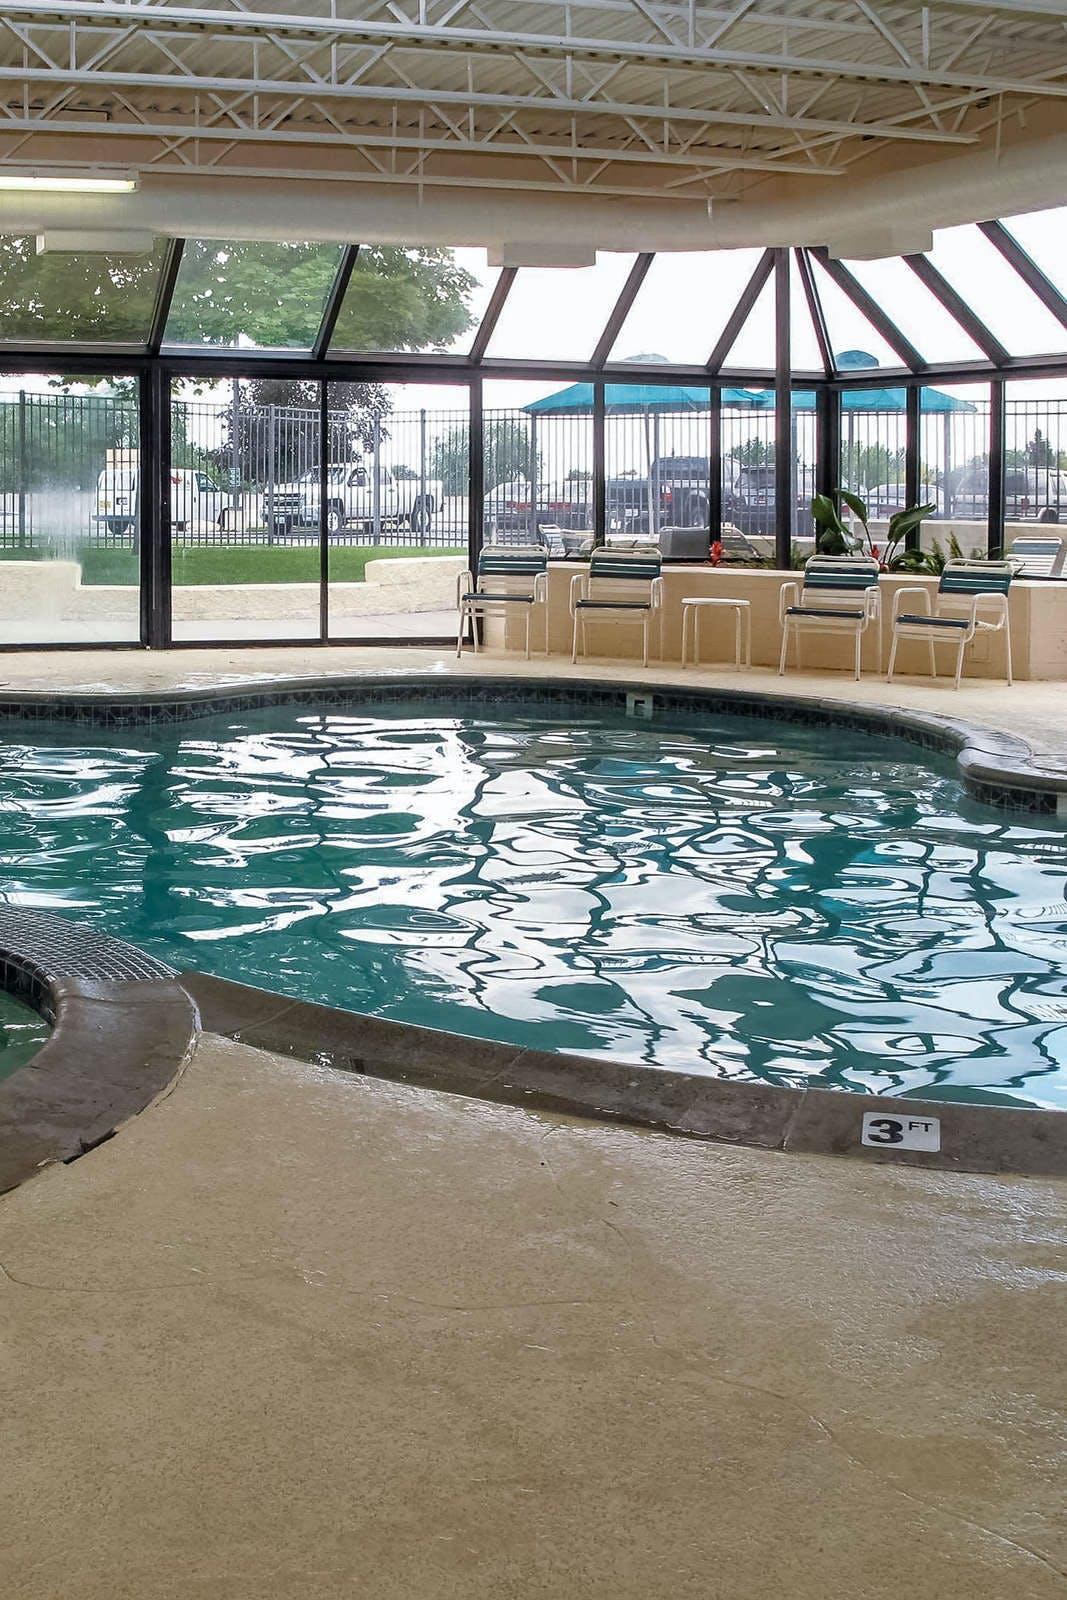 La Quinta Inn & Suites Salt Lake City Layton